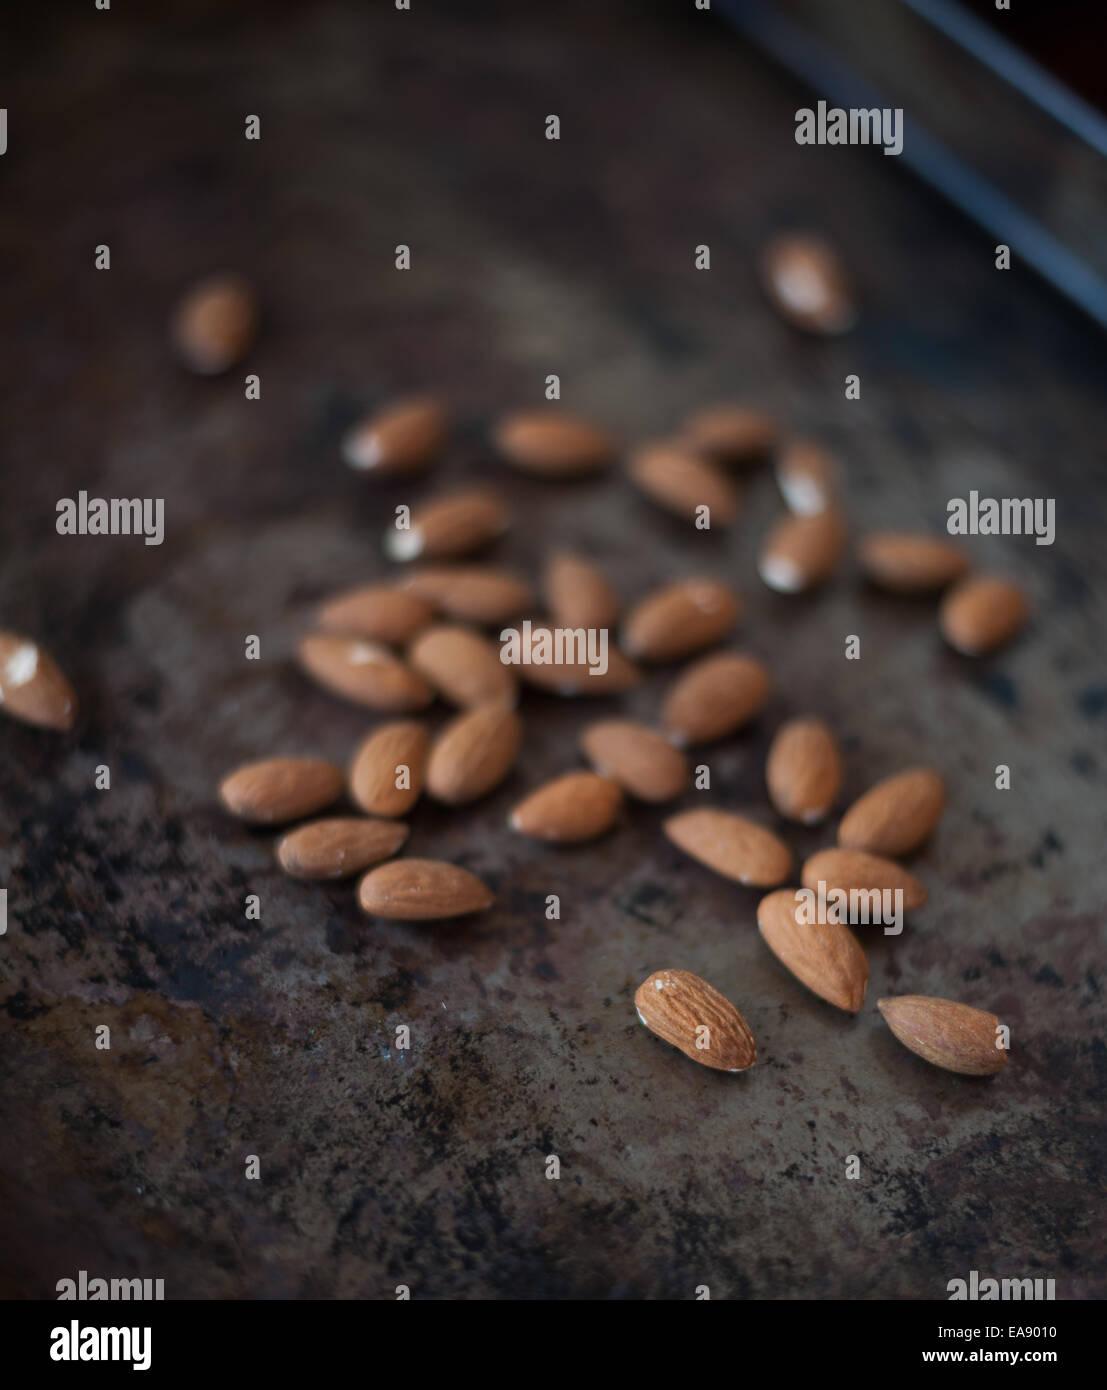 Almonds - Stock Image